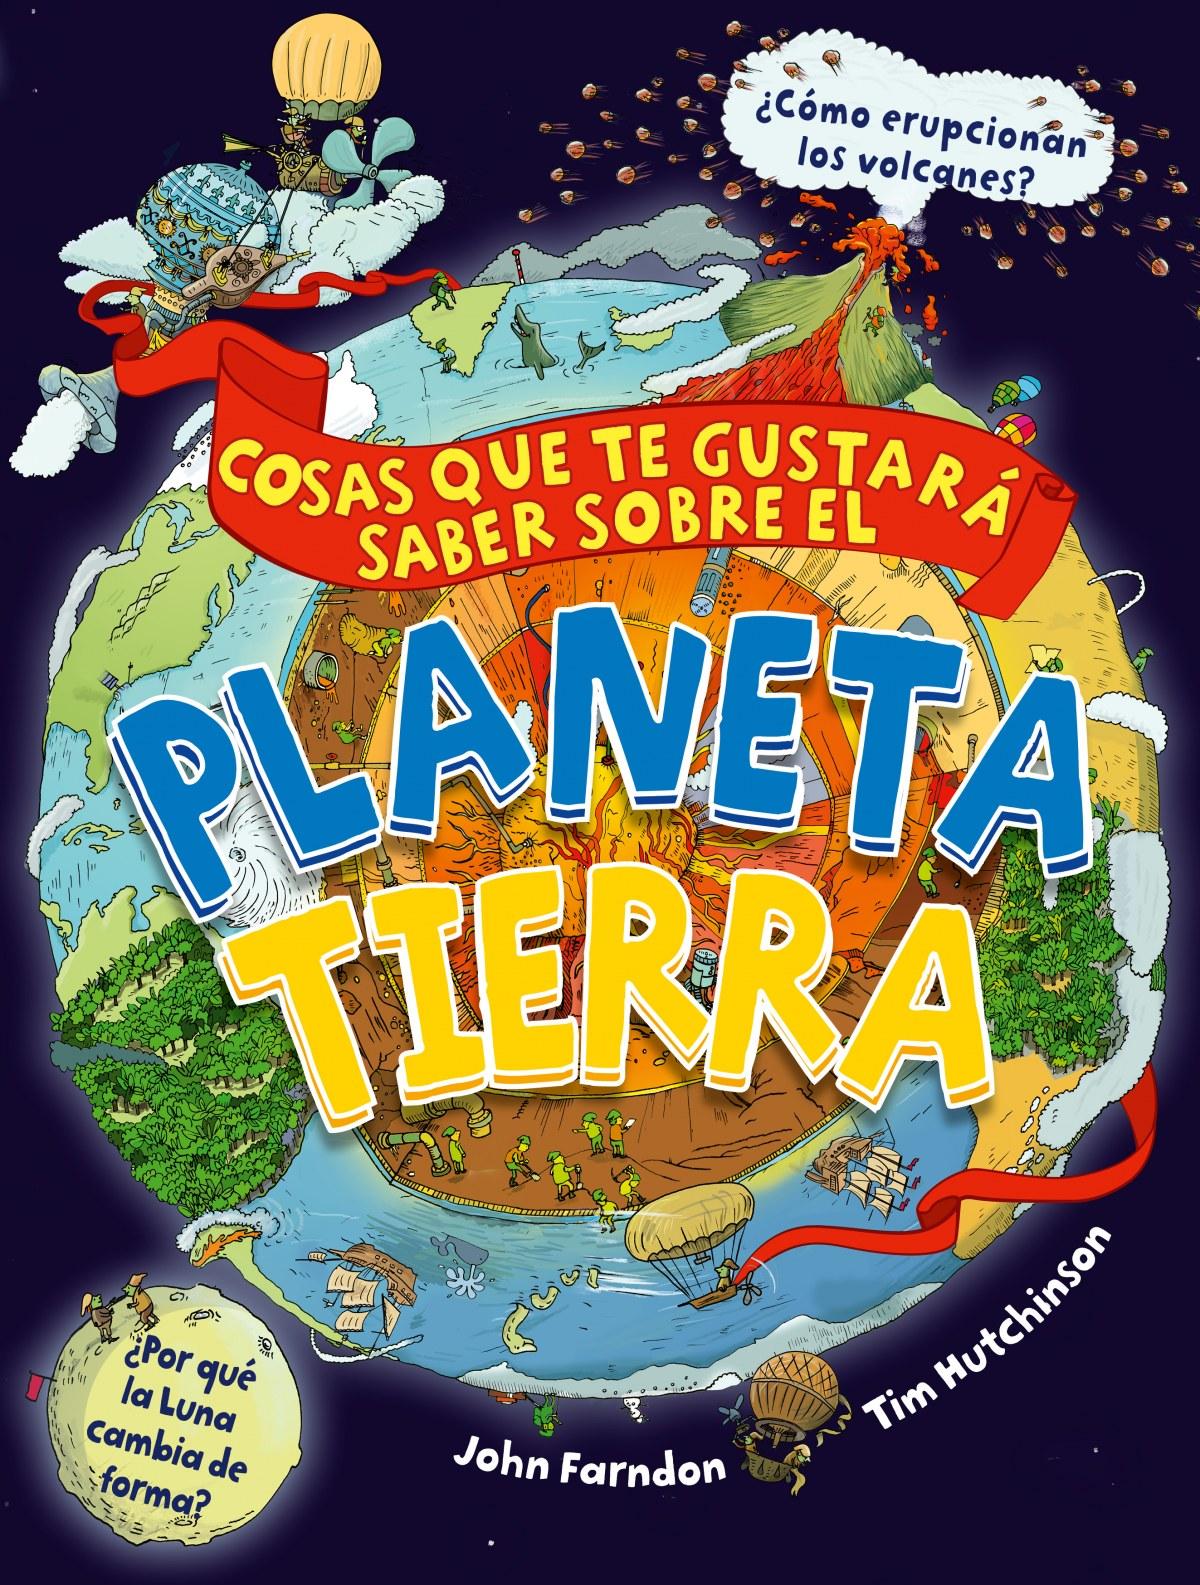 COSAS GUSTARA SABER SOBRE PLANETA TIERRA